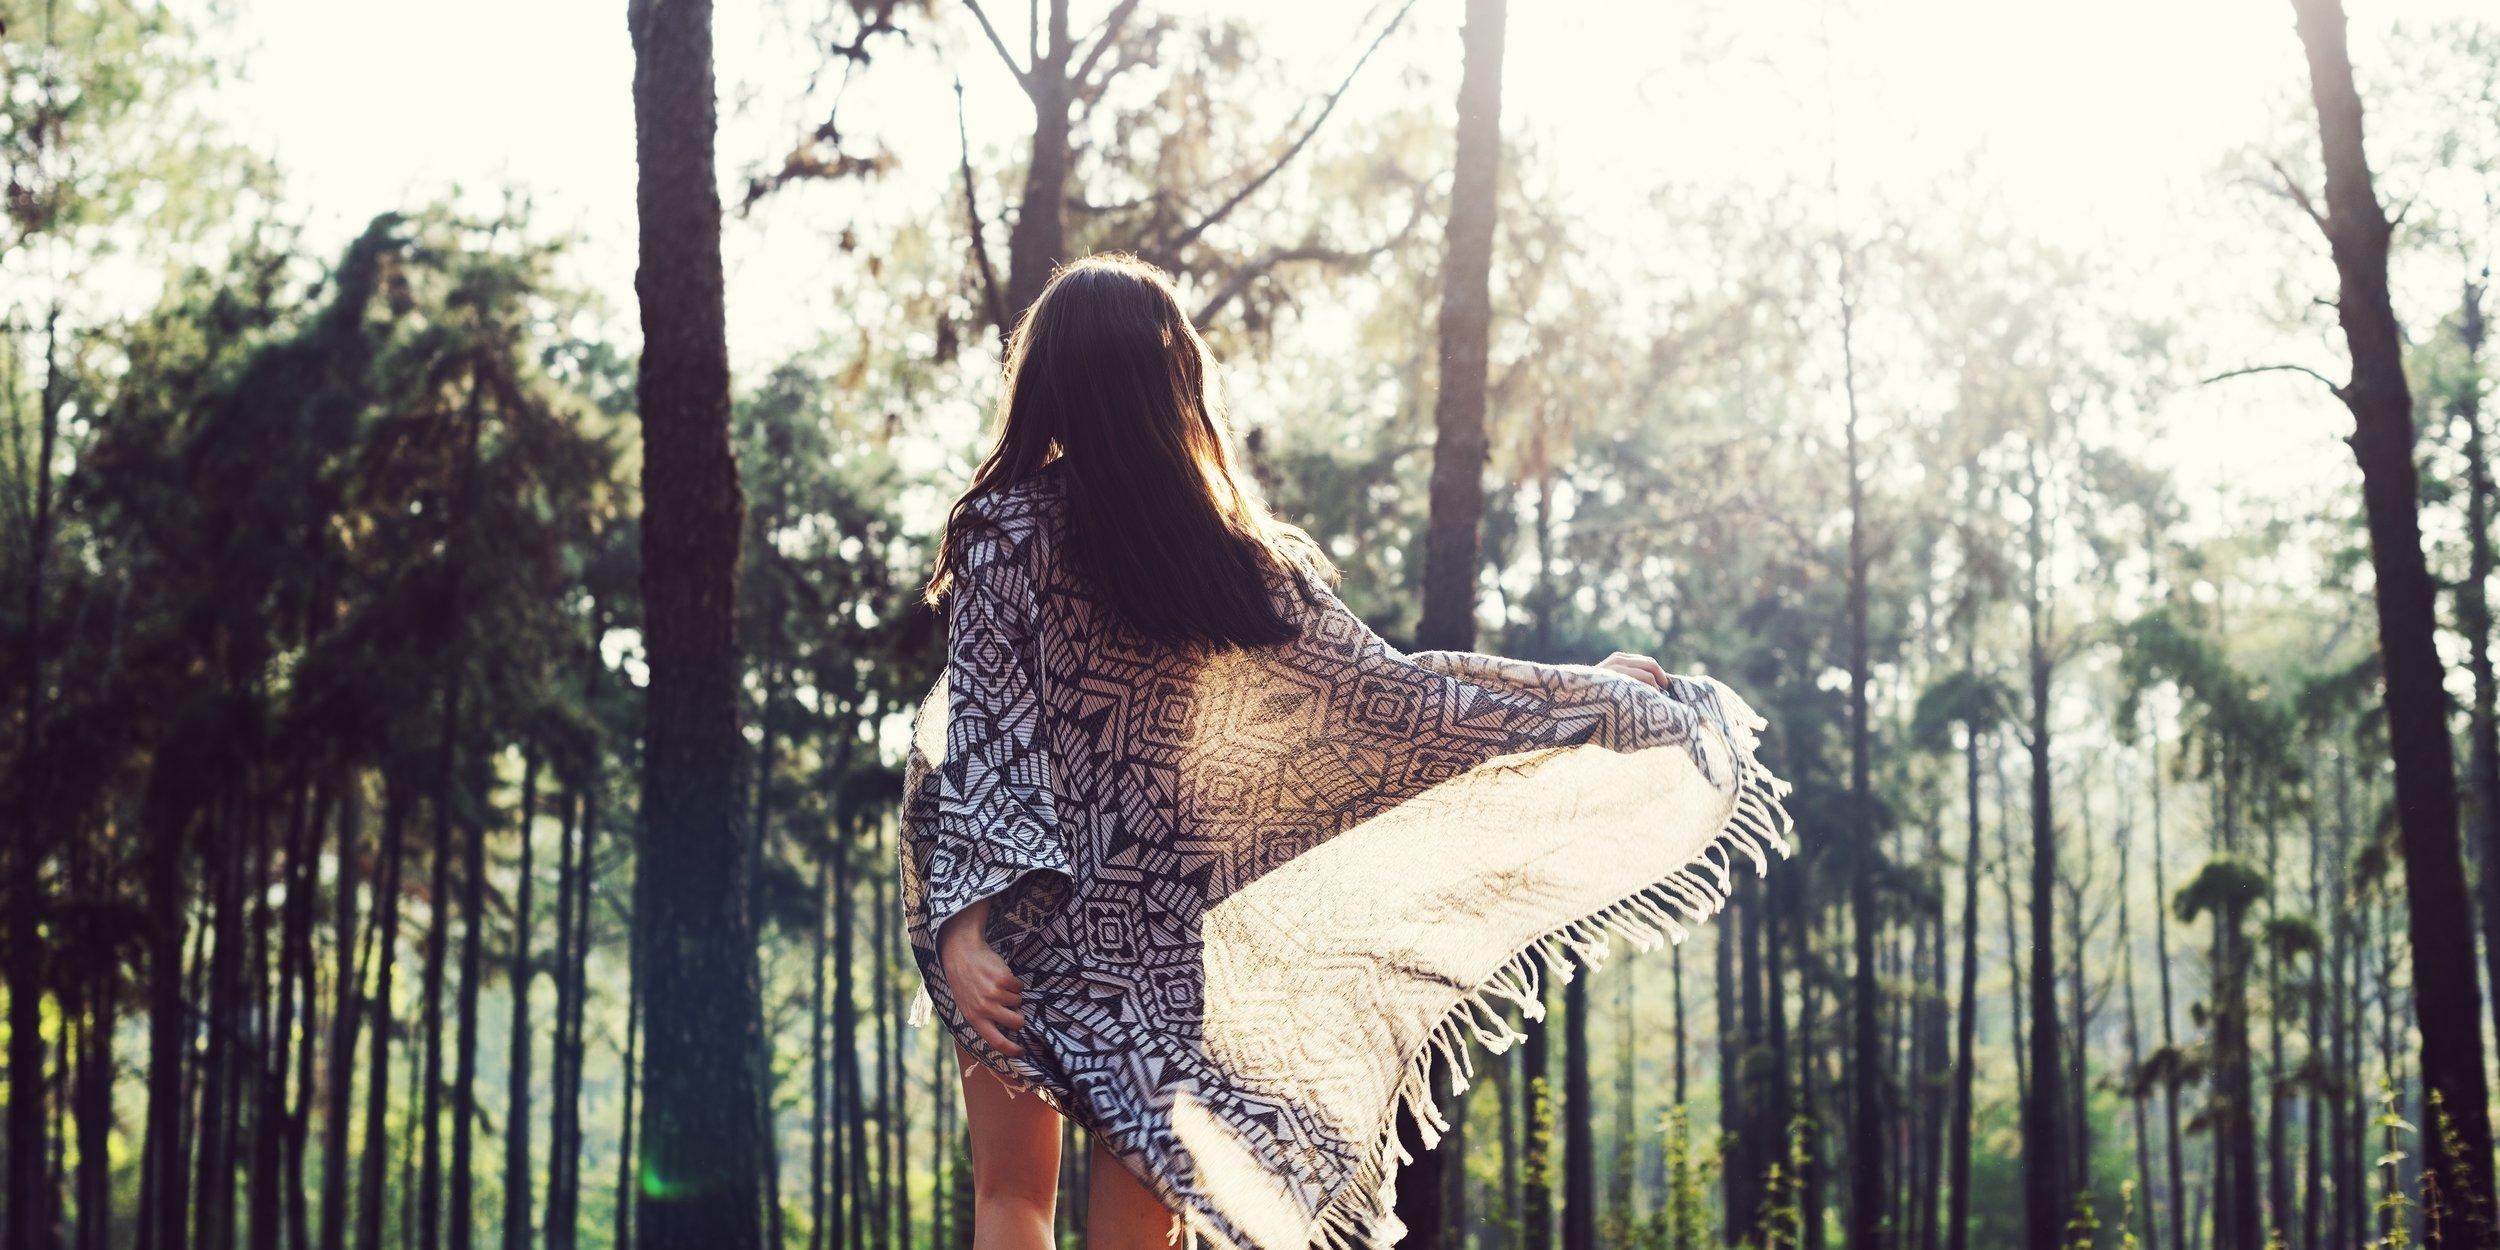 Youth-shawl-outside.jpg